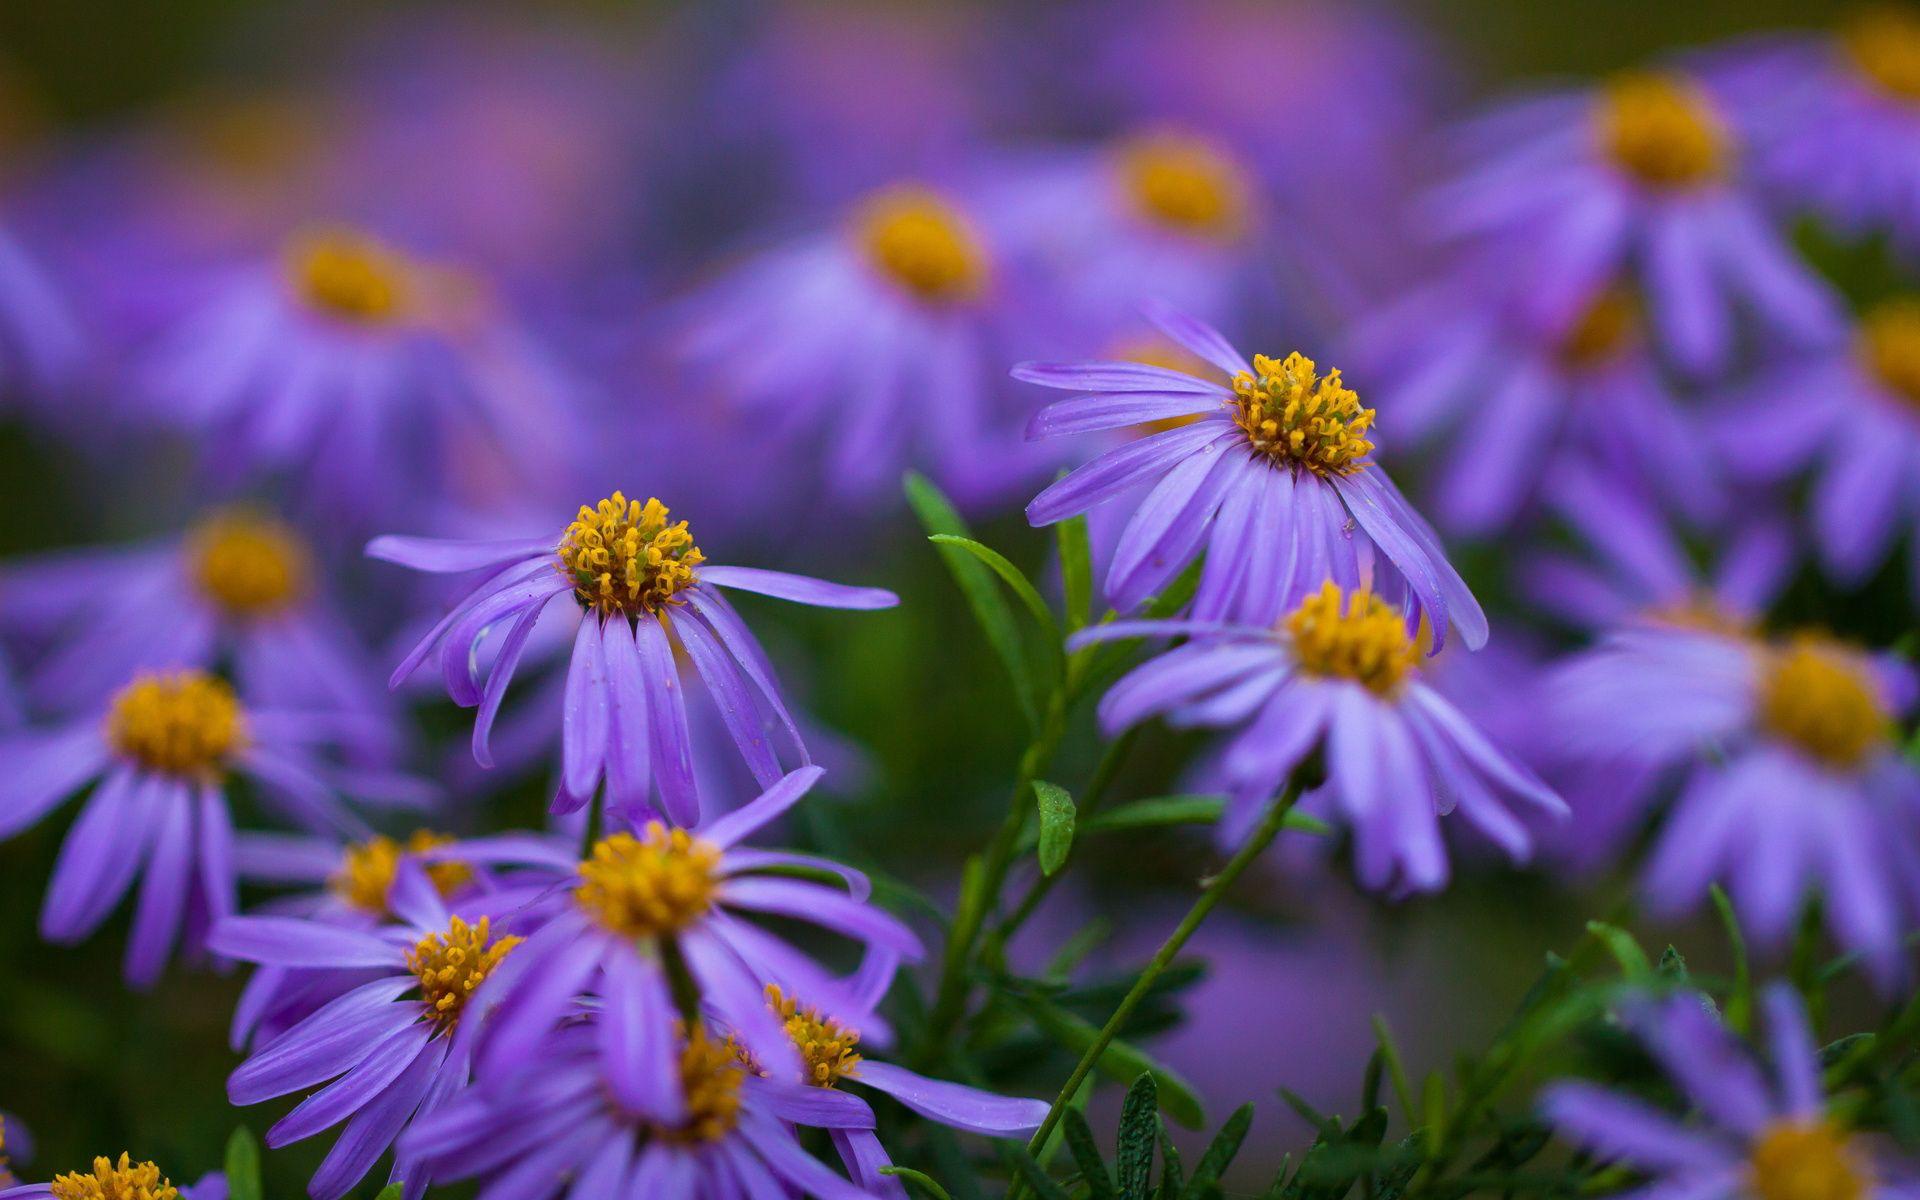 Little purple flowers hd gardens and flowers hd wallpapers pinterest little purple flowers hd mightylinksfo